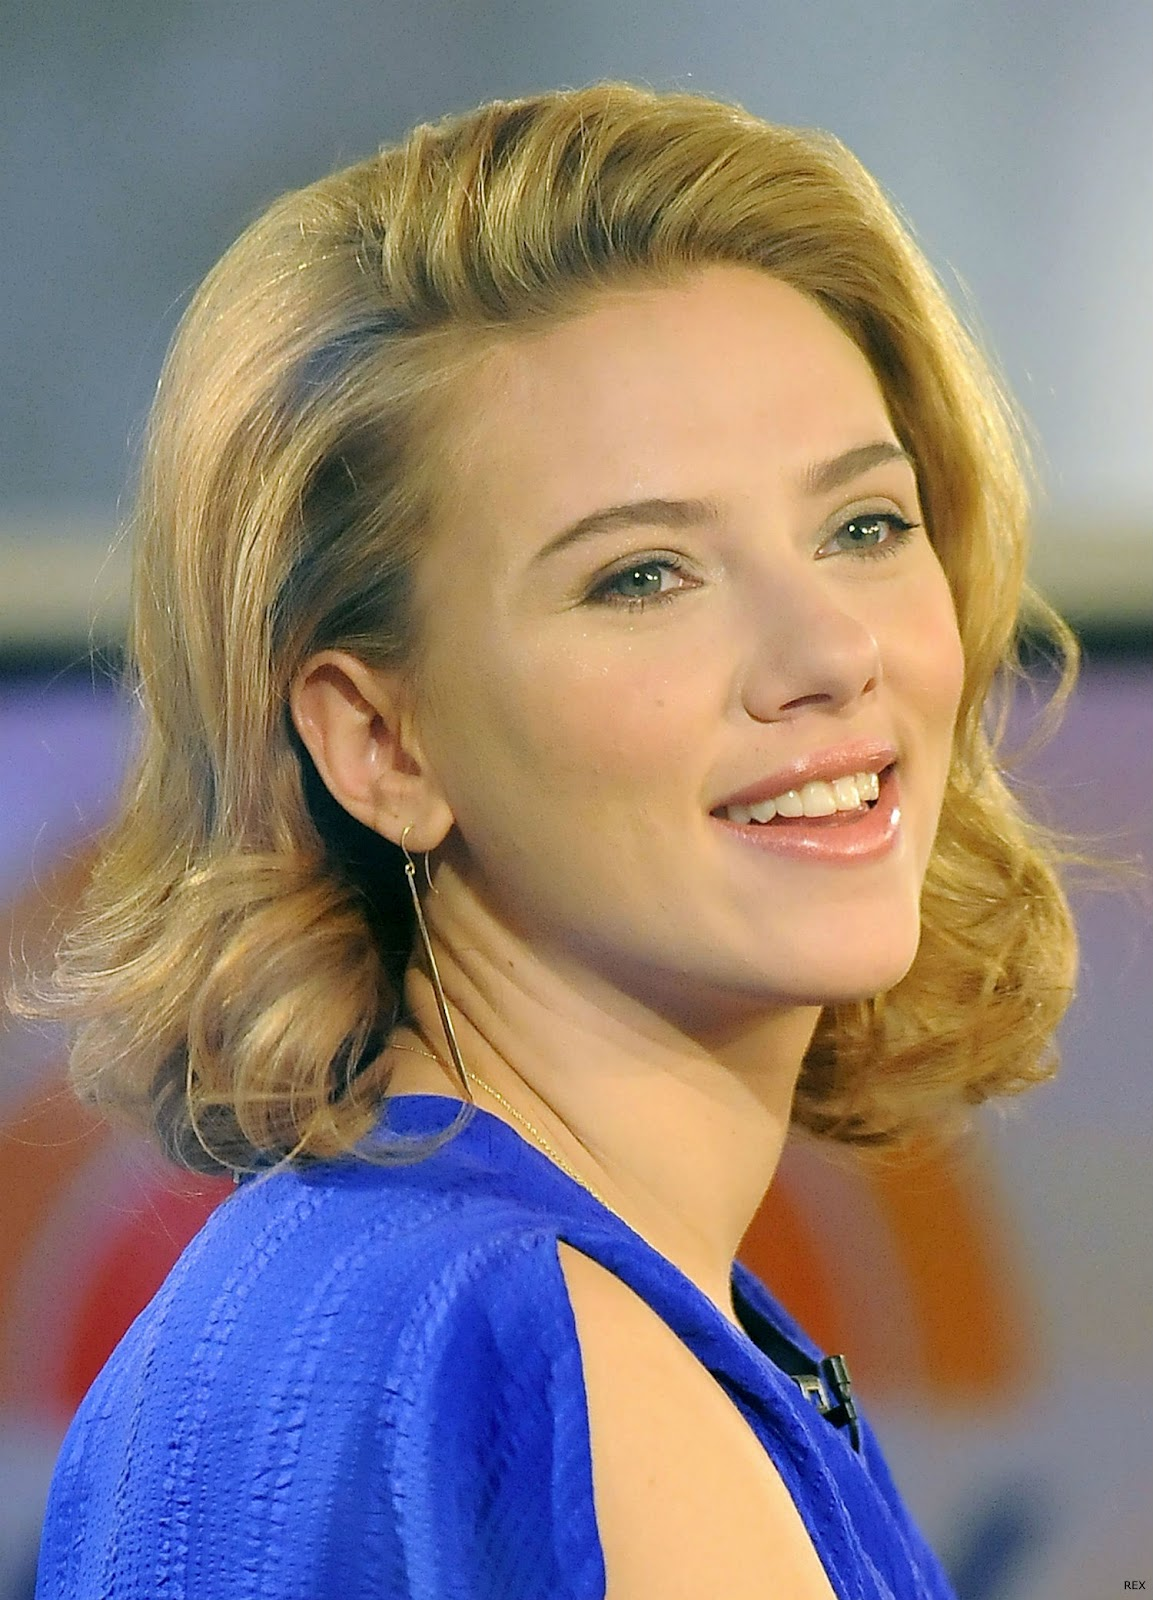 http://1.bp.blogspot.com/-MNJ8B7BUa4s/T_elJCvU_nI/AAAAAAAACUE/mULD1hPIlOc/s1600/Scarlett-Johansson-Hair-Up.jpg